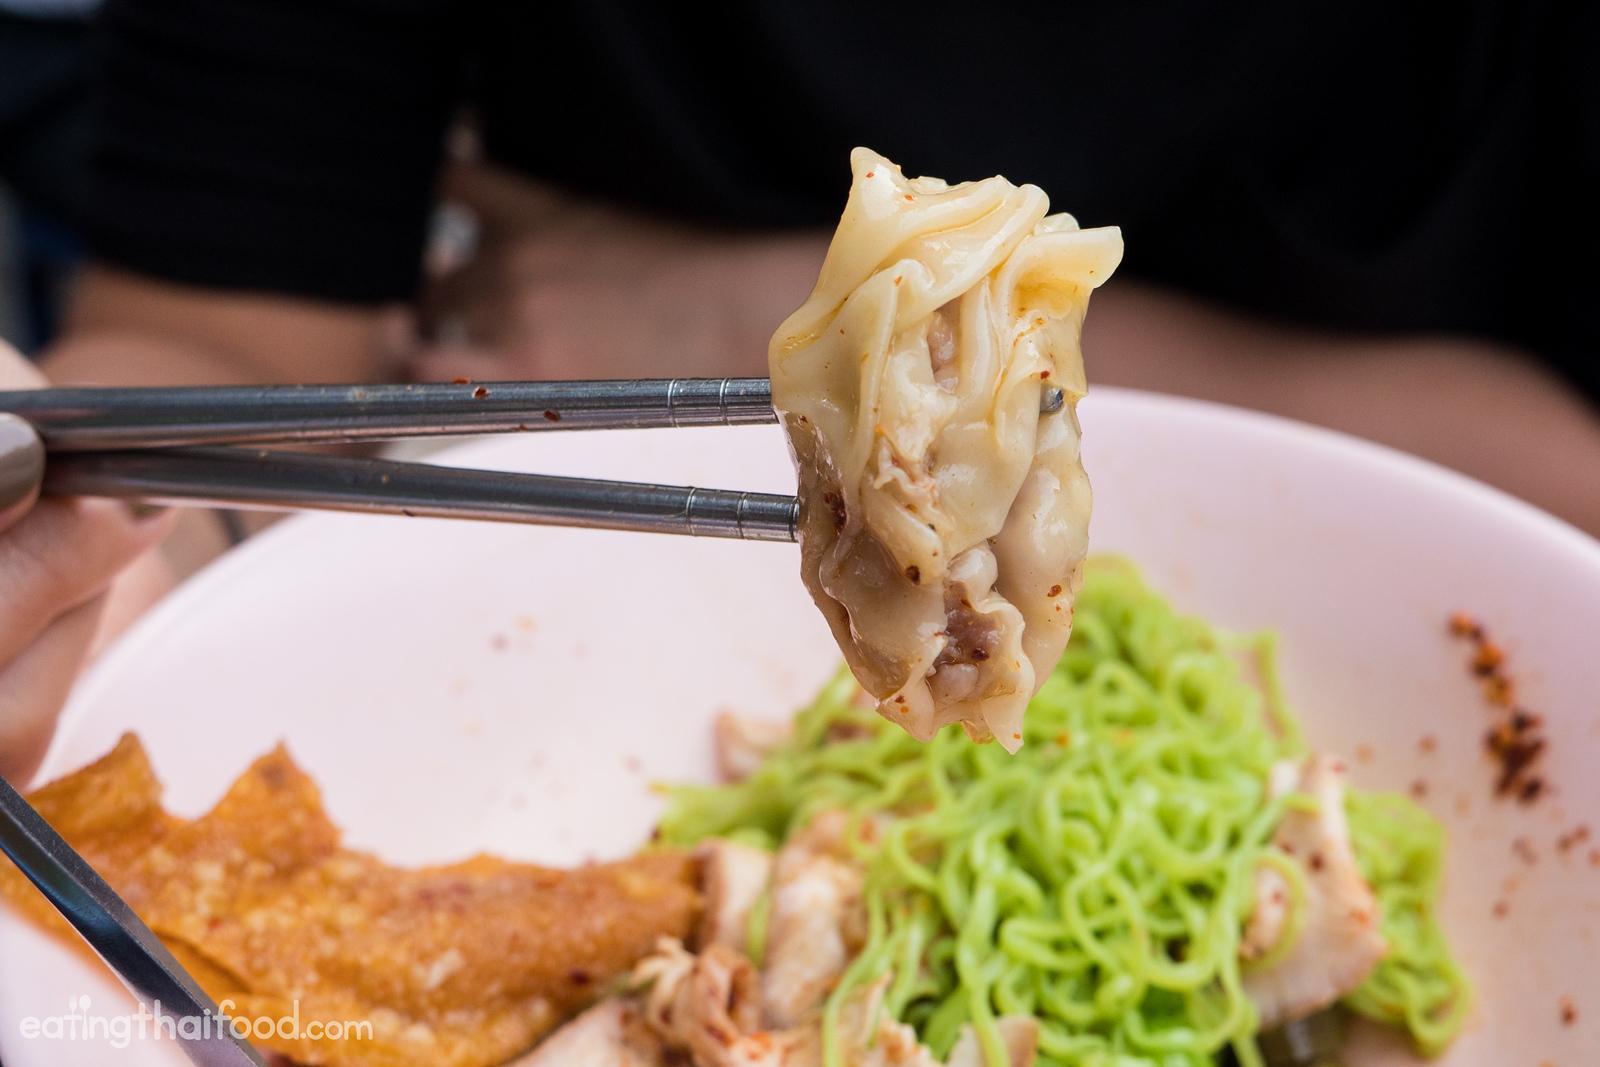 Thai egg noodles and dumplings